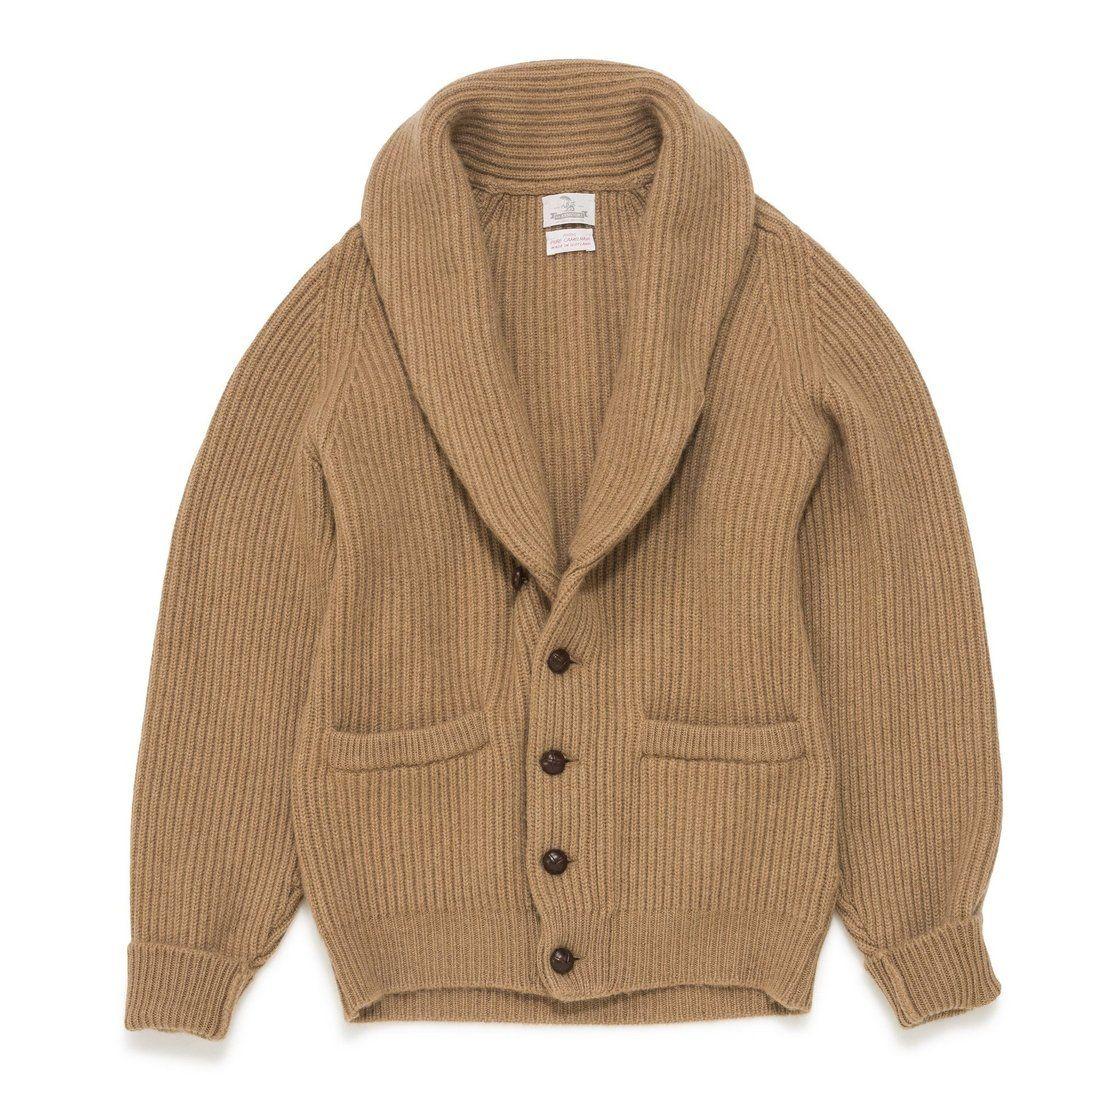 4 ply Camelhair Shawl collar Cardigan   Sweaters women